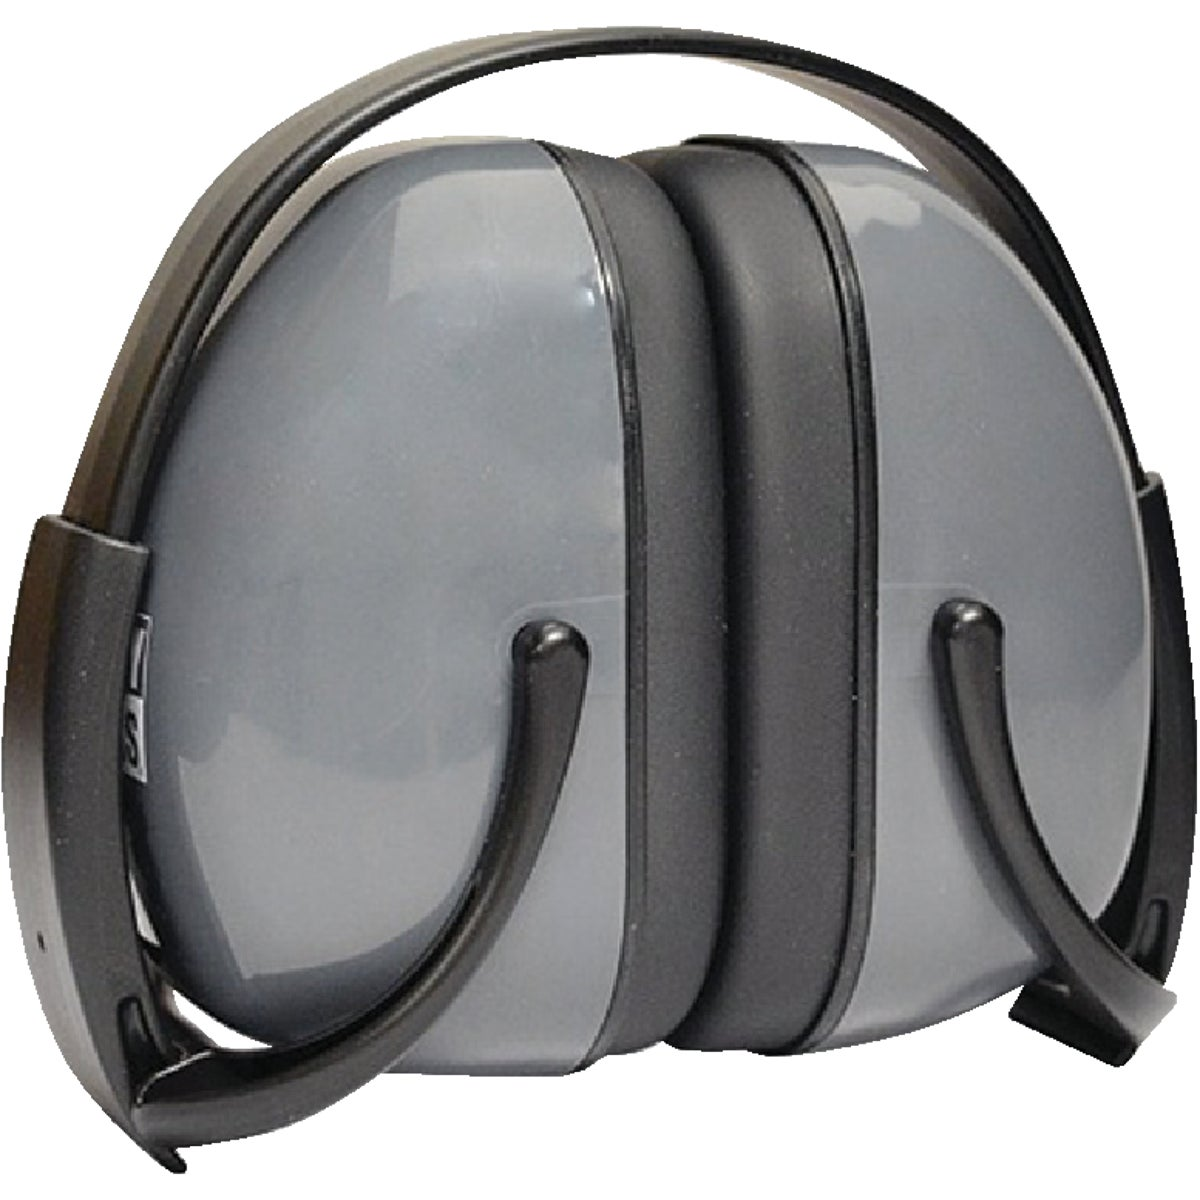 MSA Safety/InCom FOLDABLE EARMUFFS 10033236